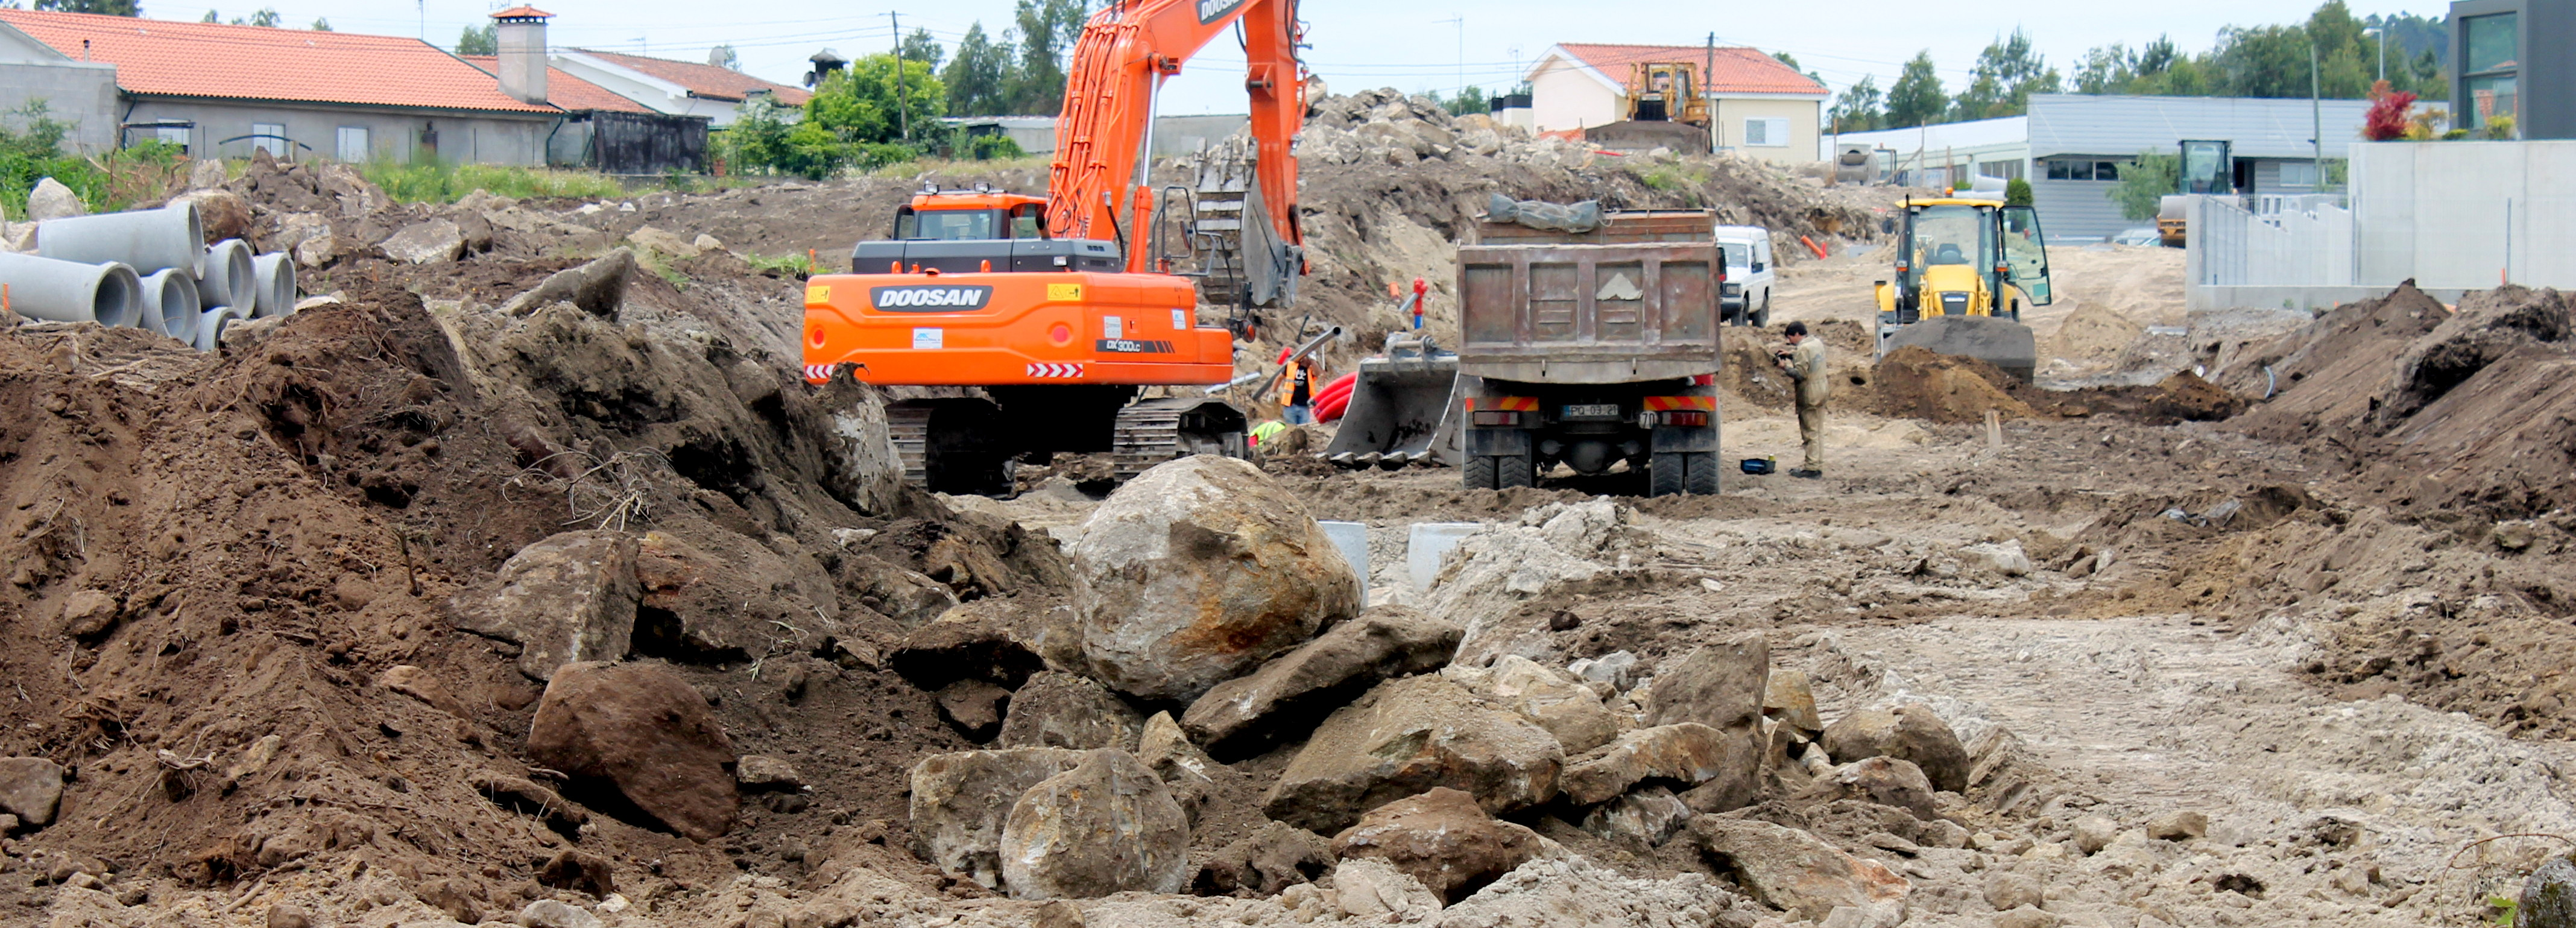 Câmara Municipal constrói arruamento no Parque Industrial do Corujo